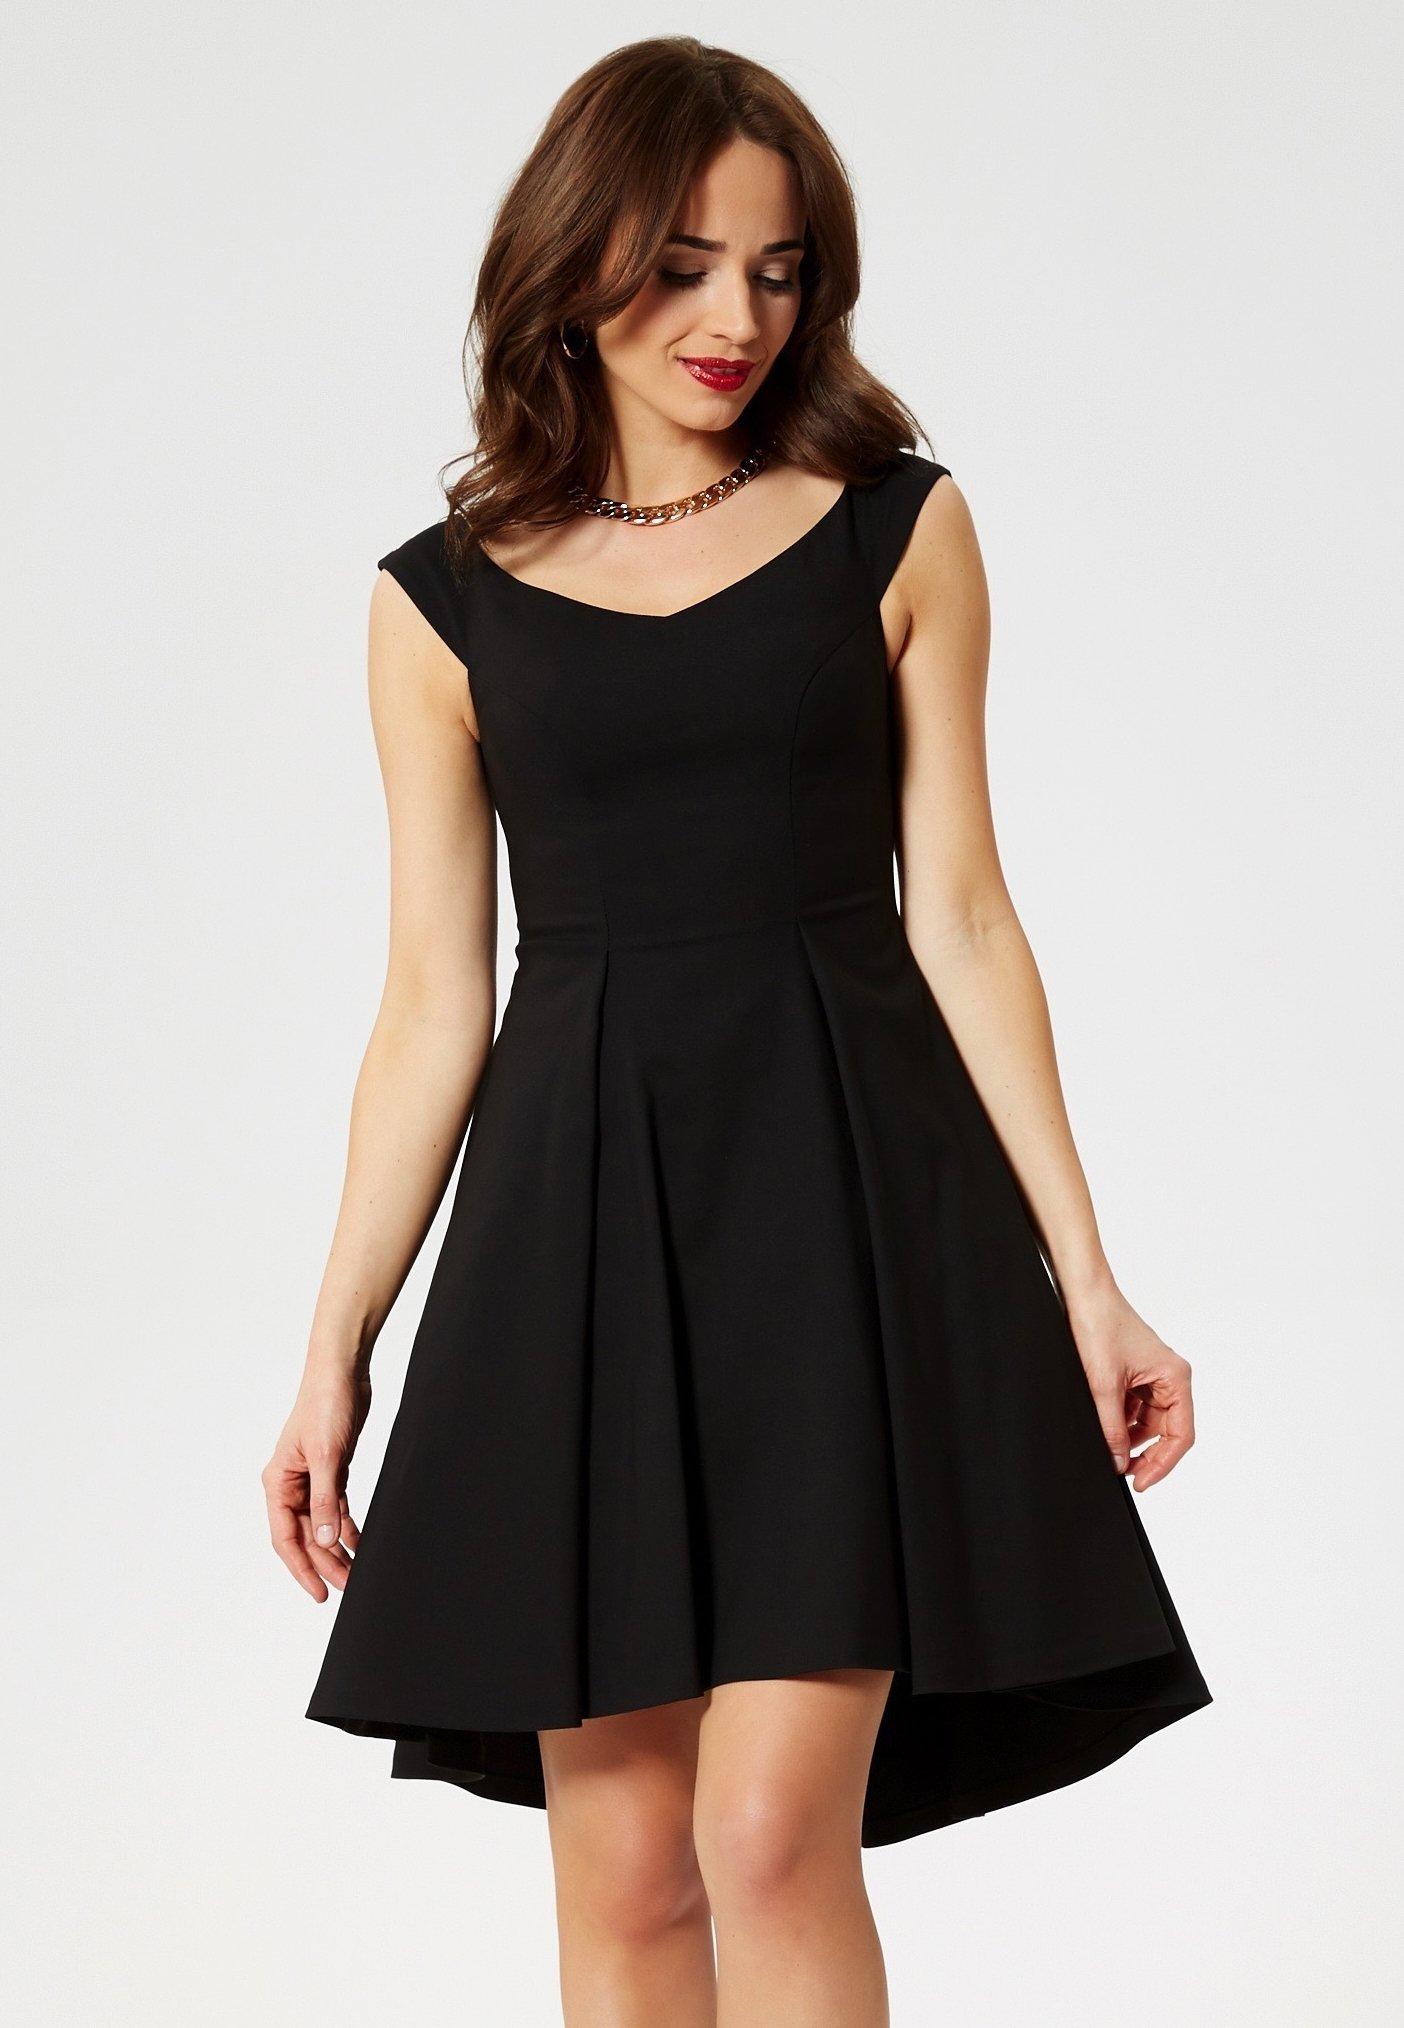 Aaa Quality Women's Clothing faina Day dress black yAcGIDPPx